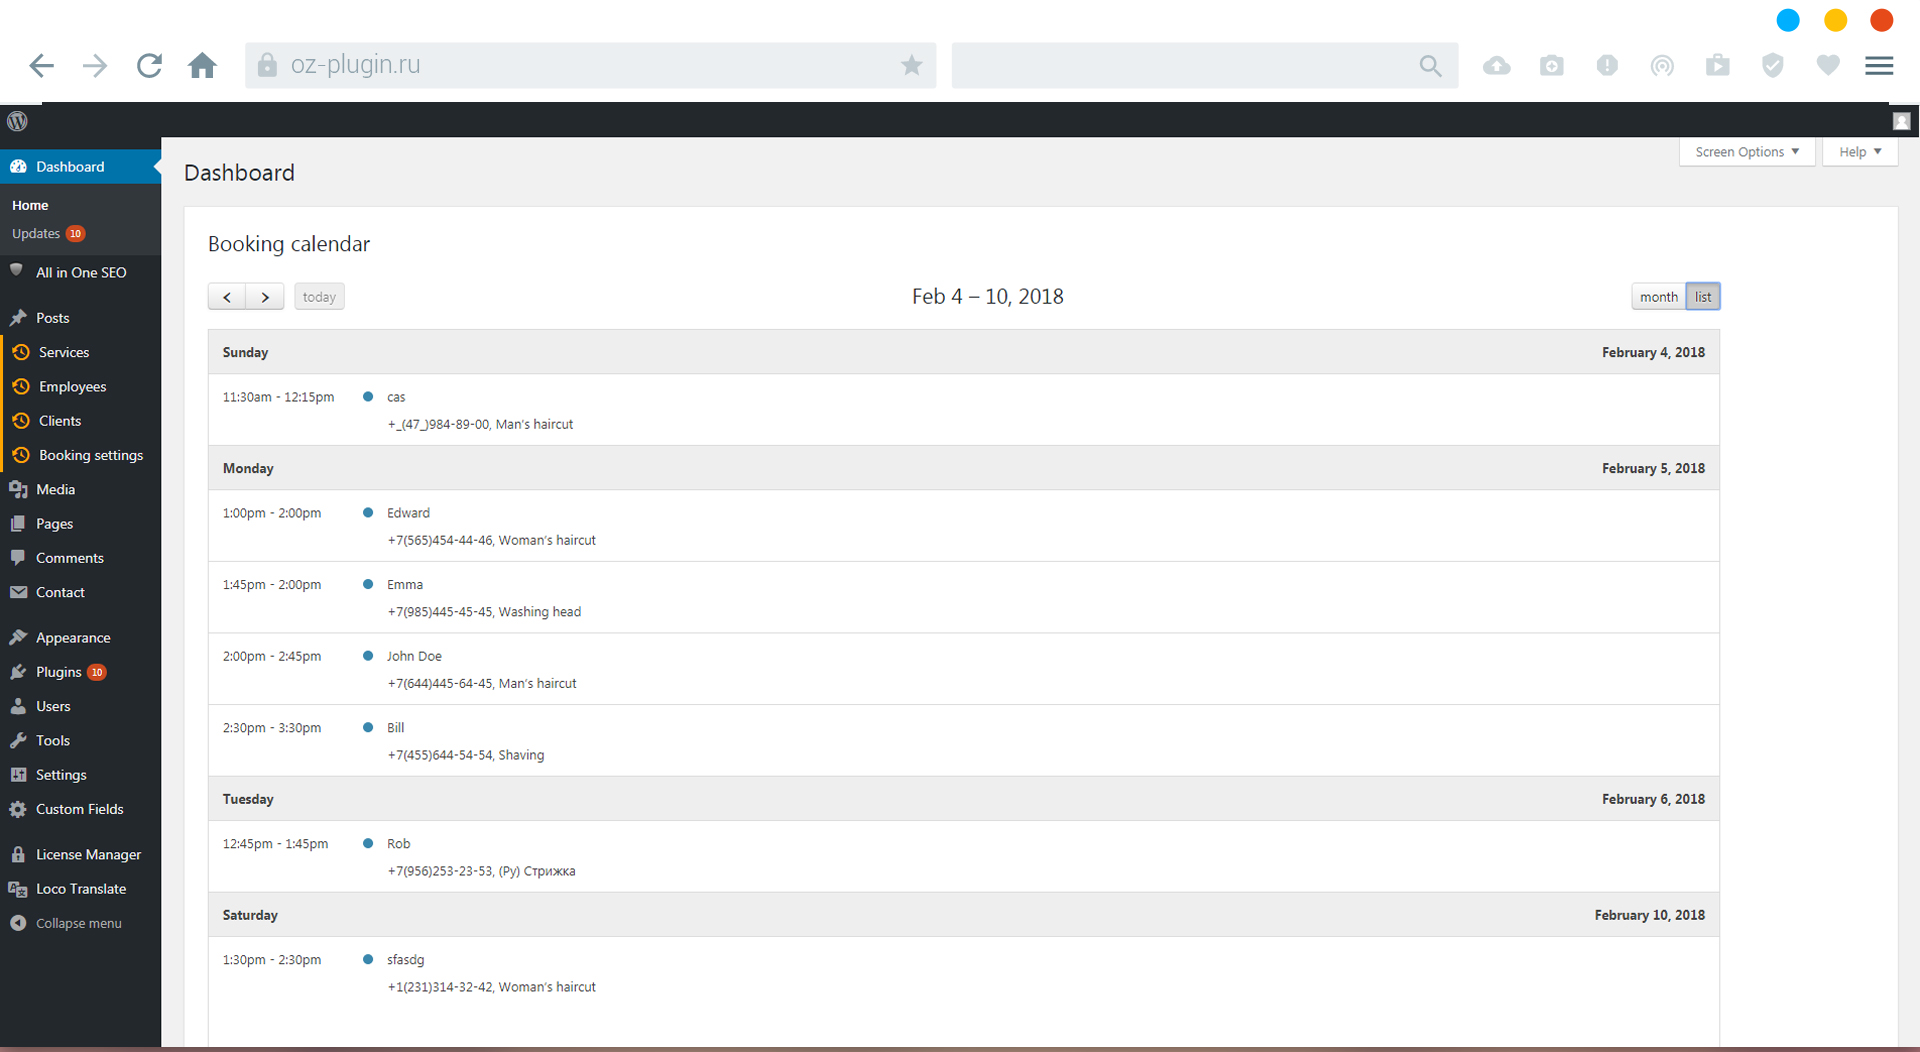 Dashboard WP. List view